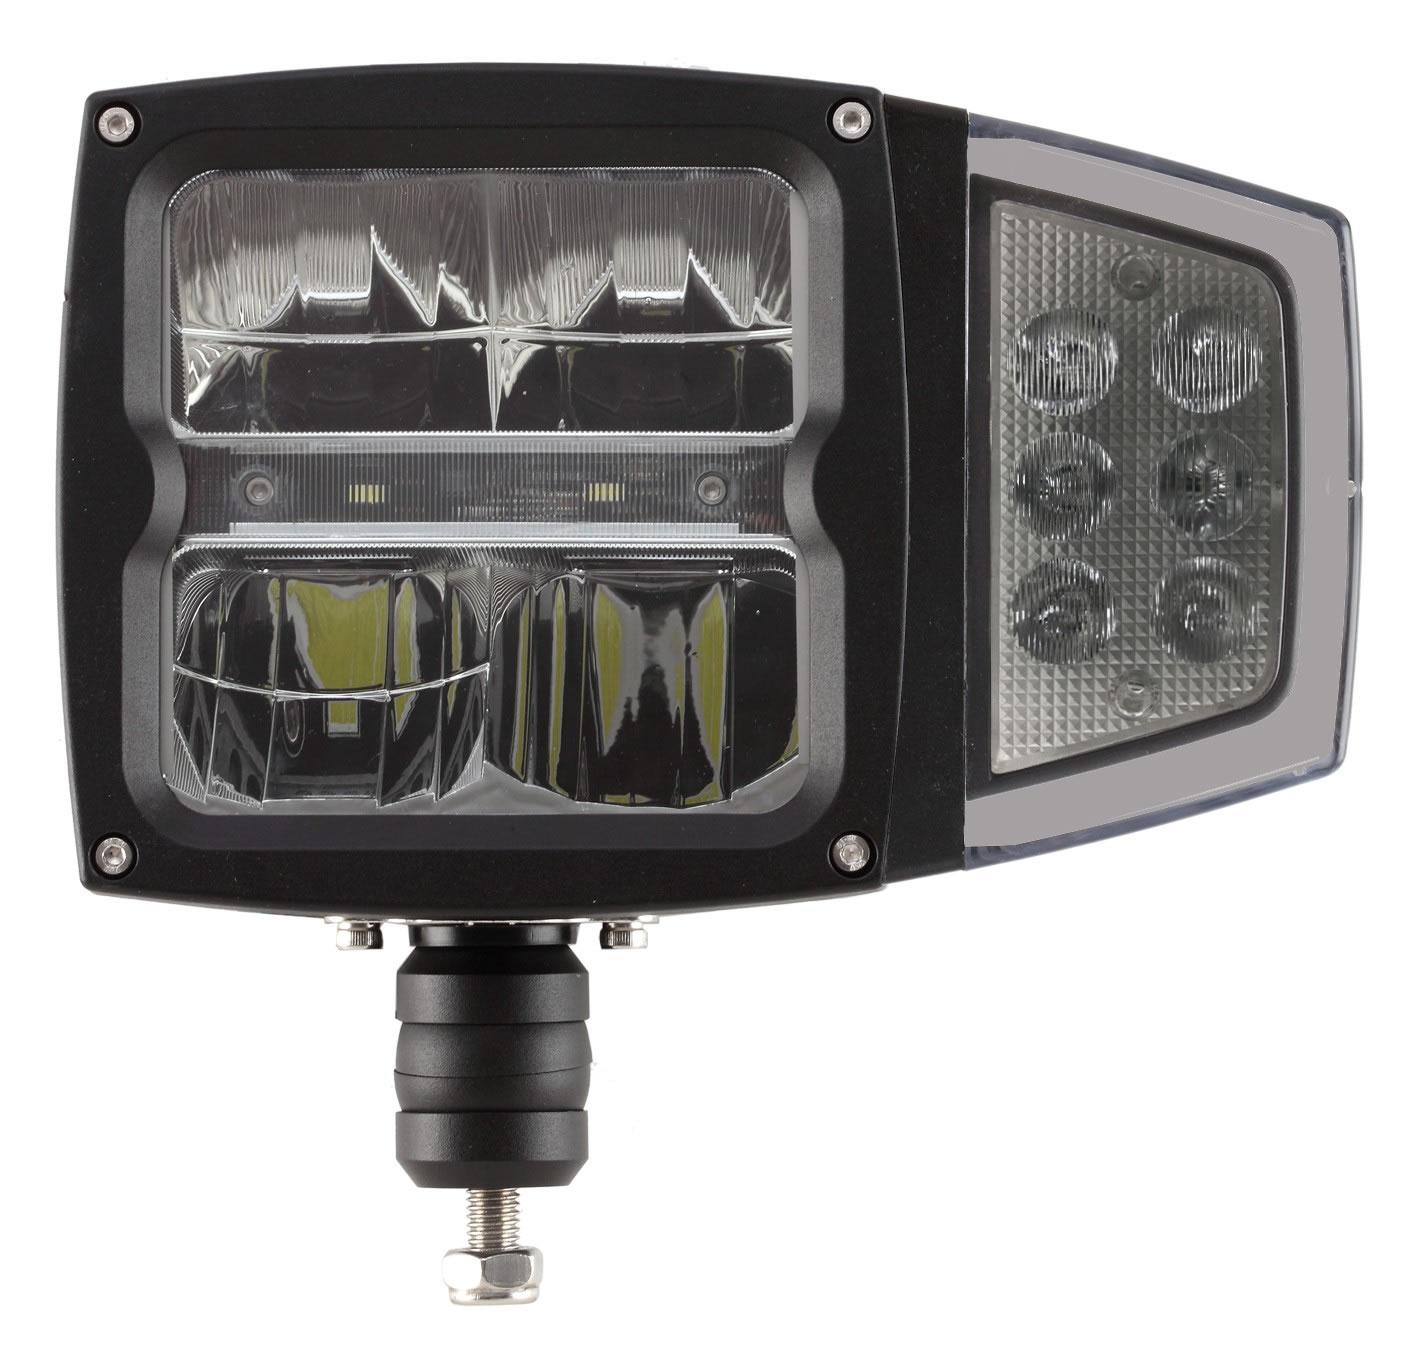 LED Huvudstrålkastare/Ploglampa med blinkers